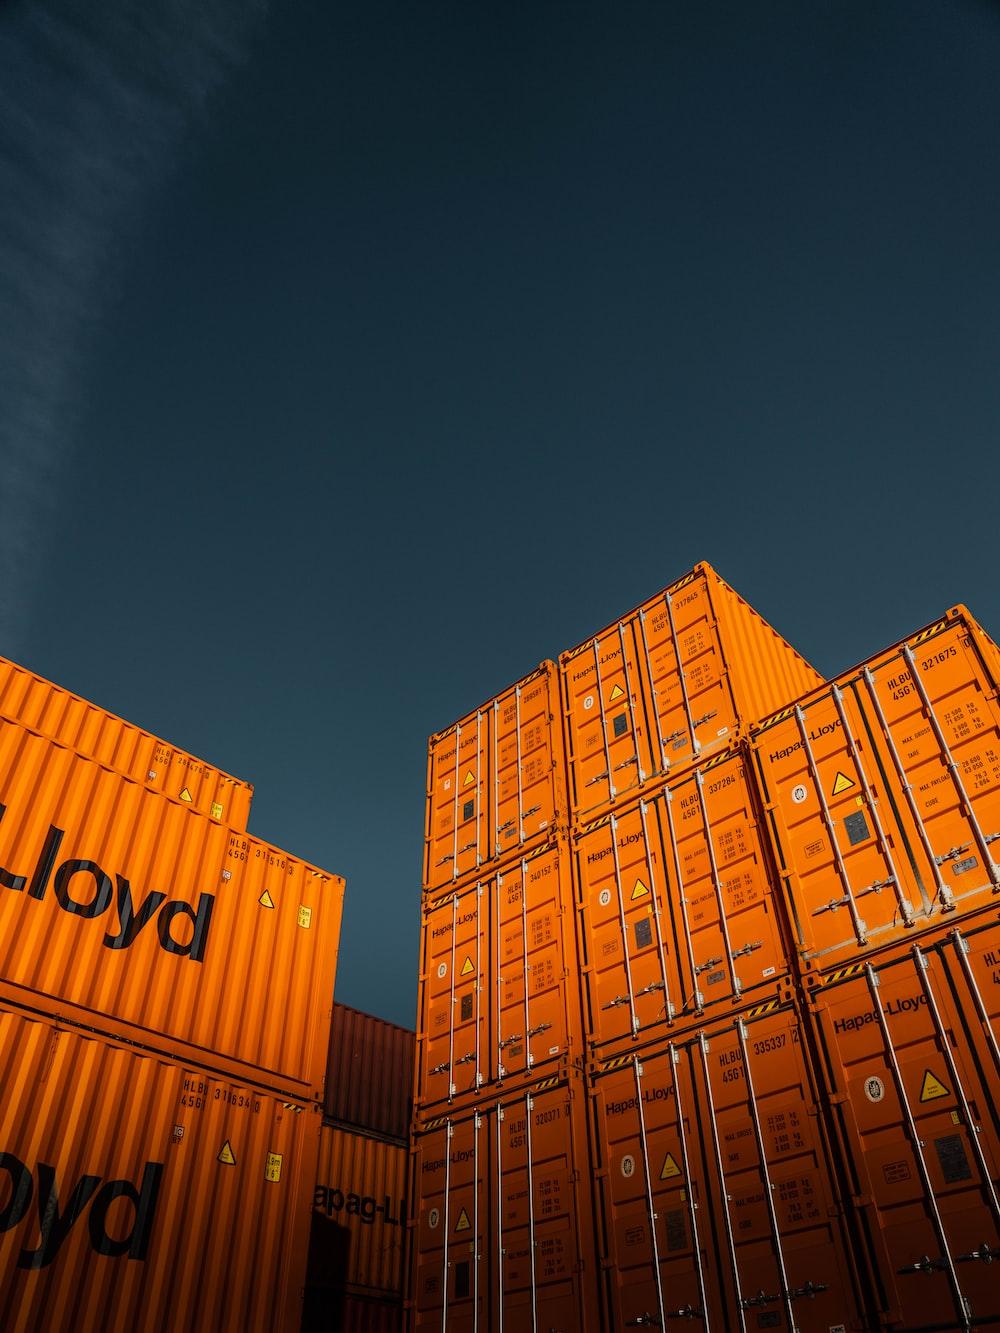 brown cardboard boxes under blue sky during daytime